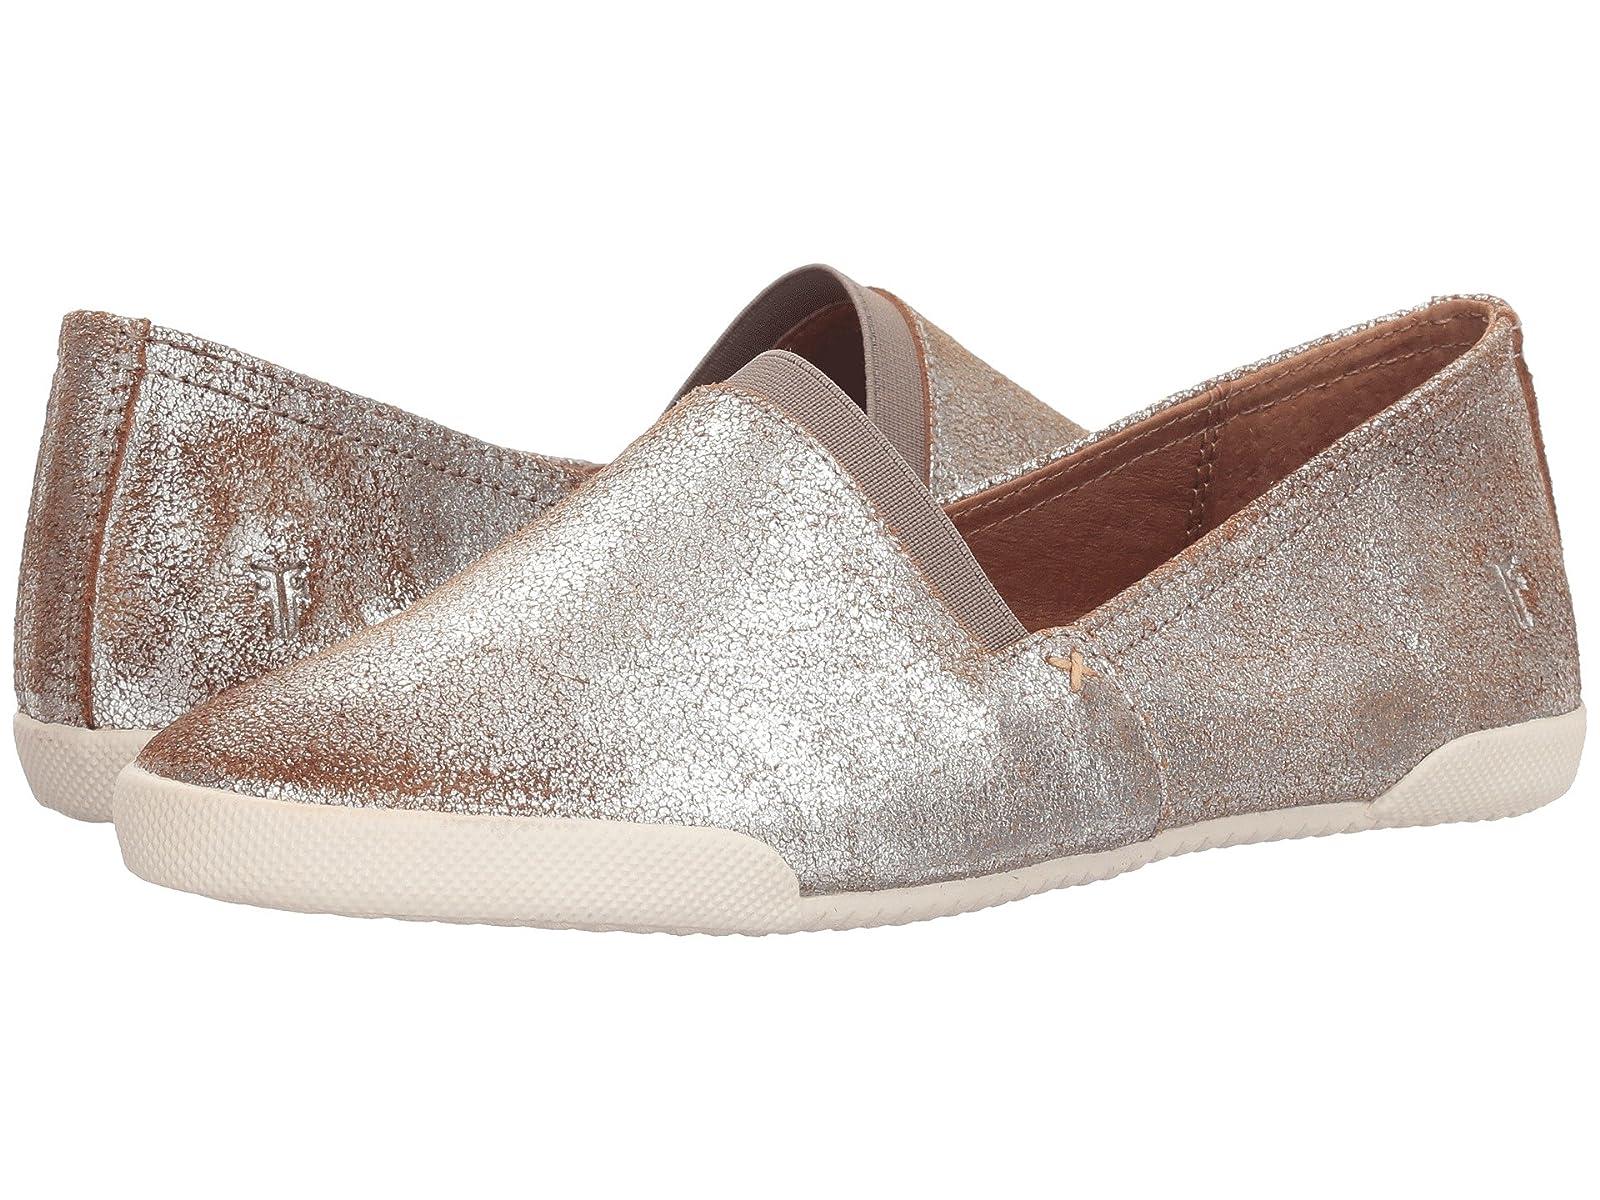 Frye Melanie Slip-OnAtmospheric grades have affordable shoes